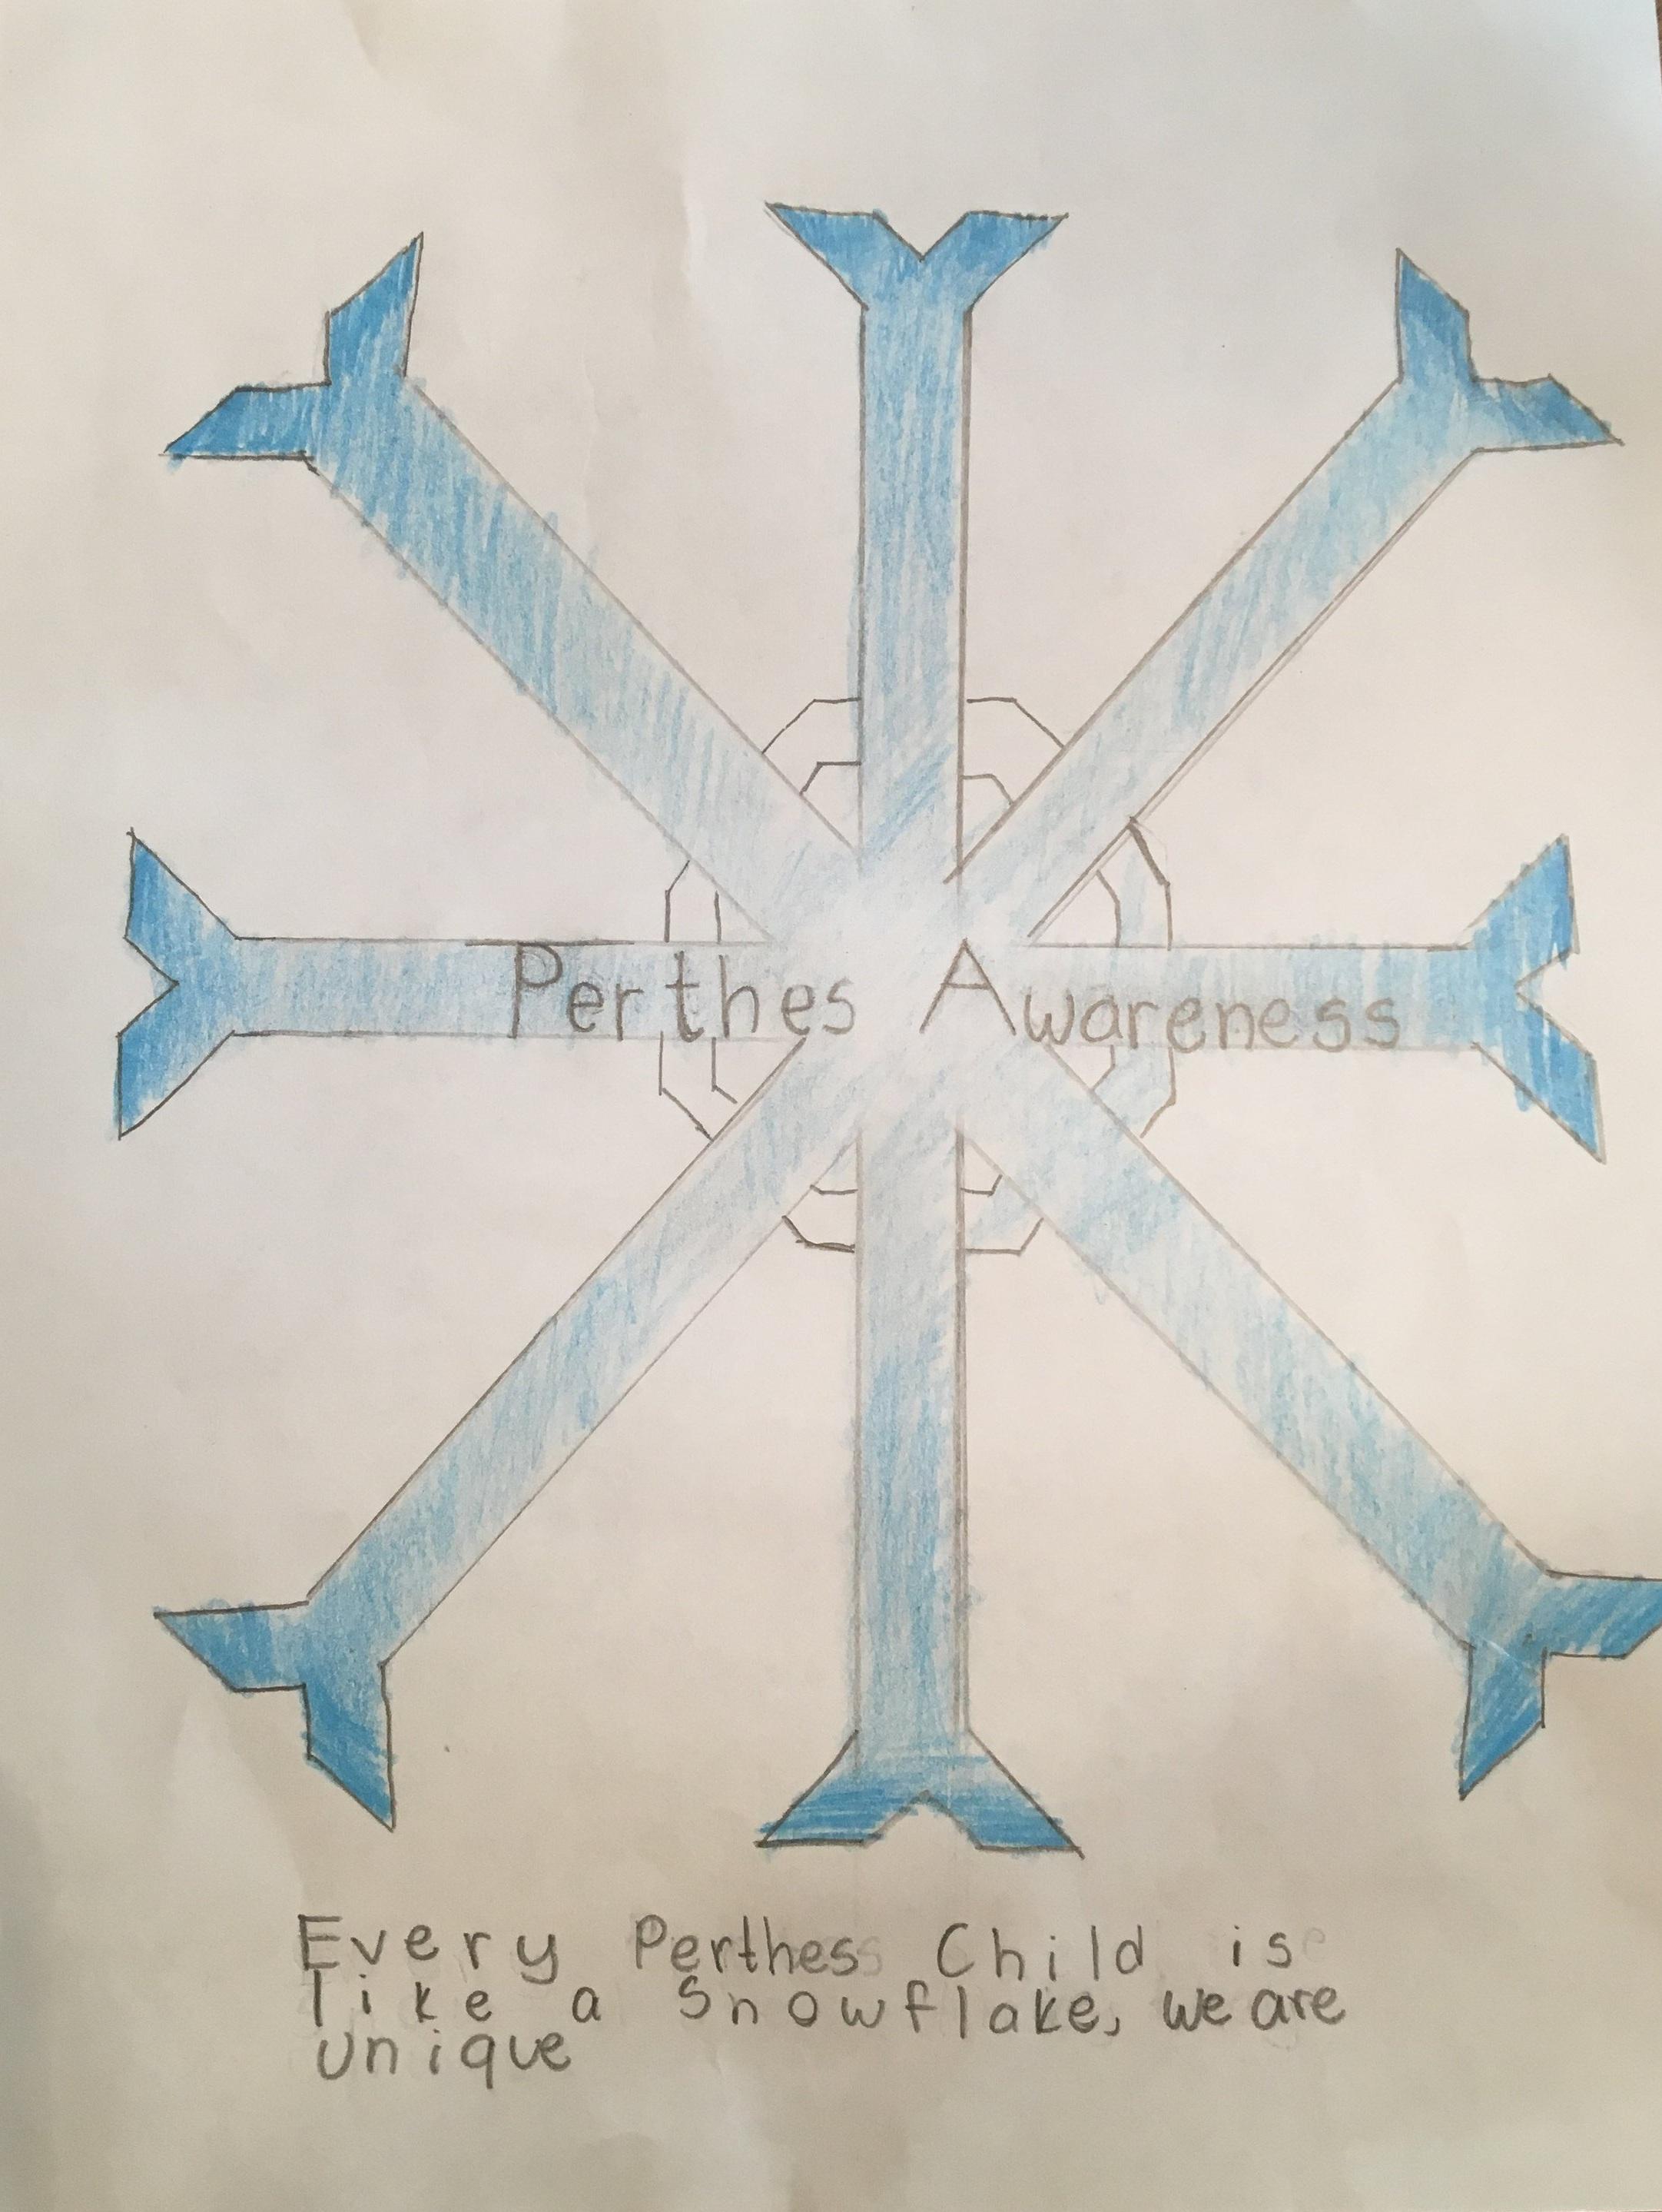 002 - PERTHES UNIQUE by Nicholas Giffuni (age 13) in Gainesville, Florida, USA